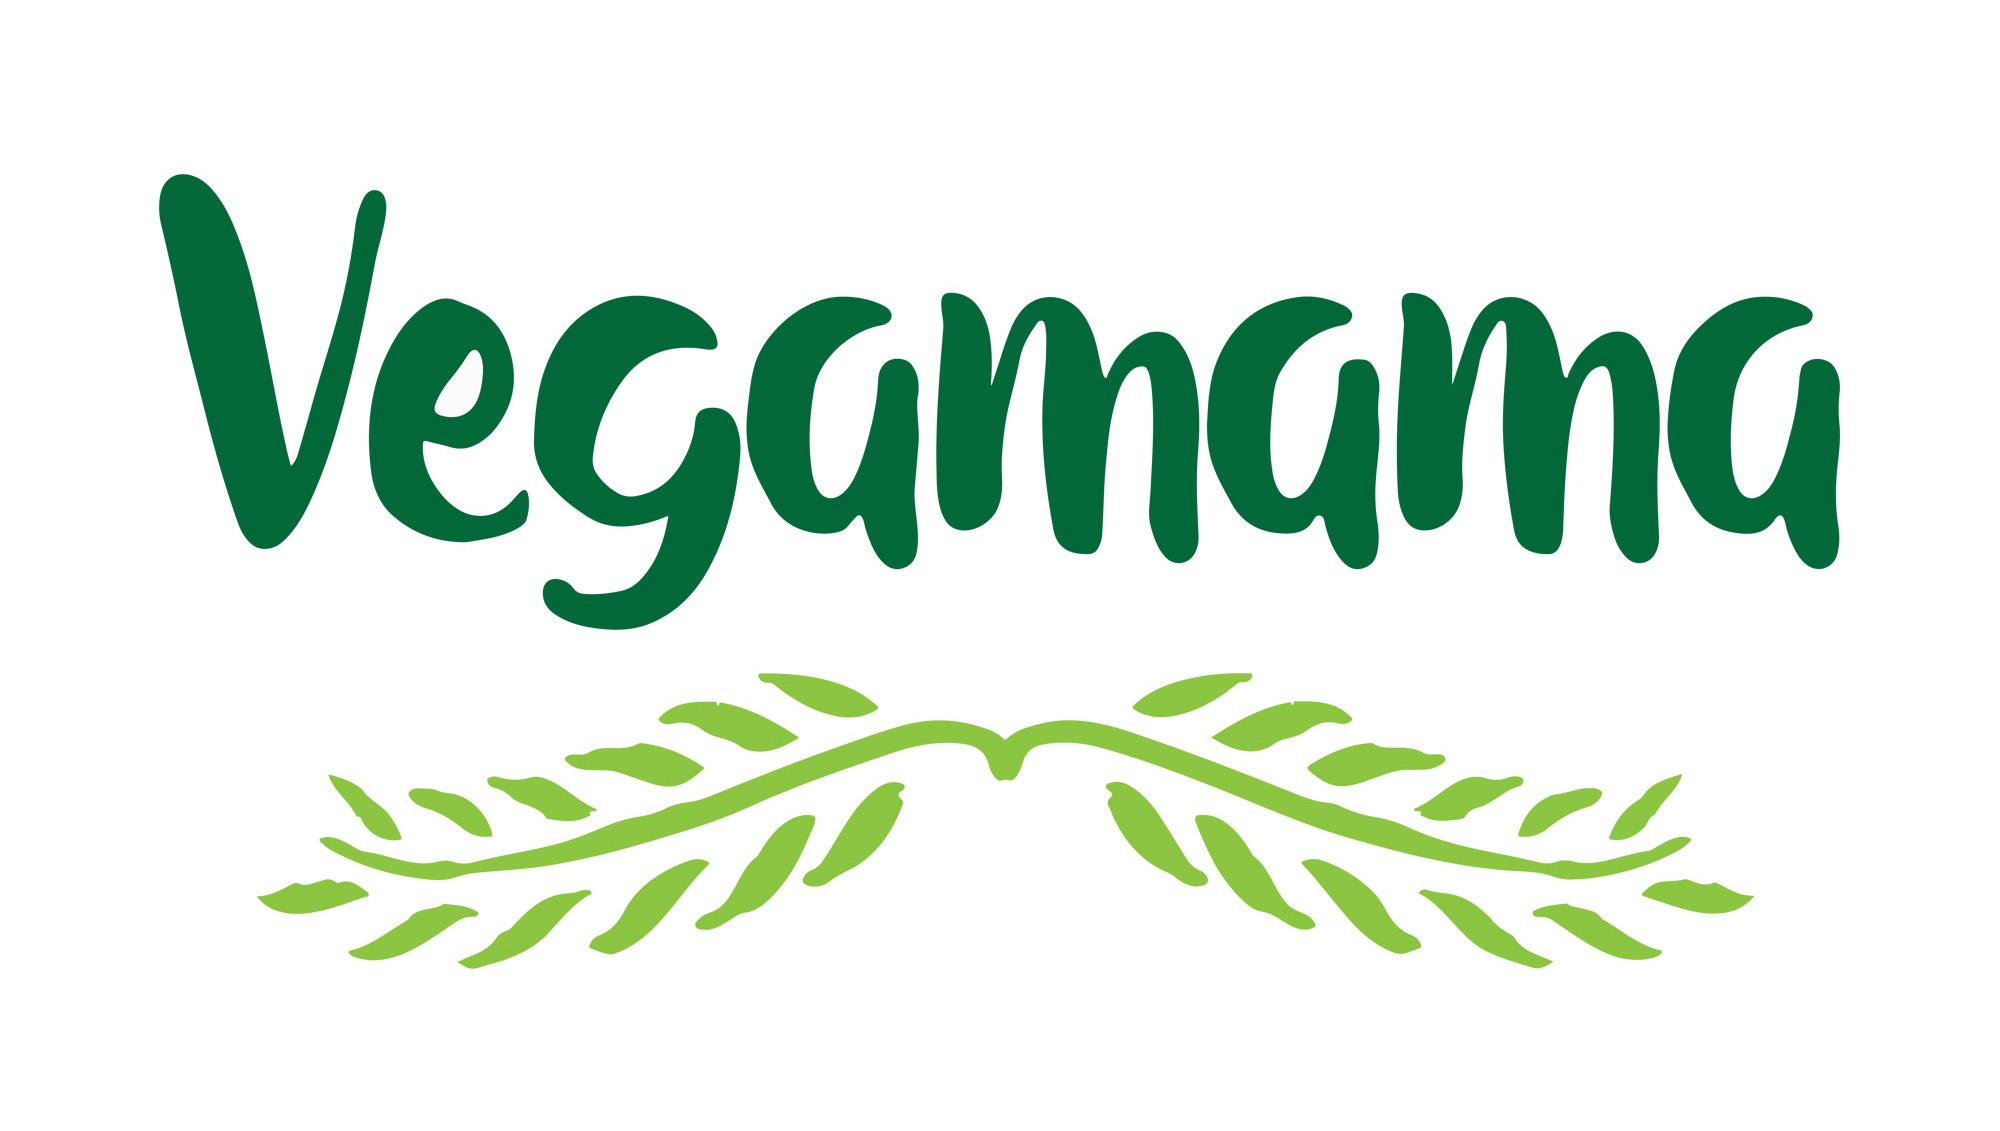 Vegamama